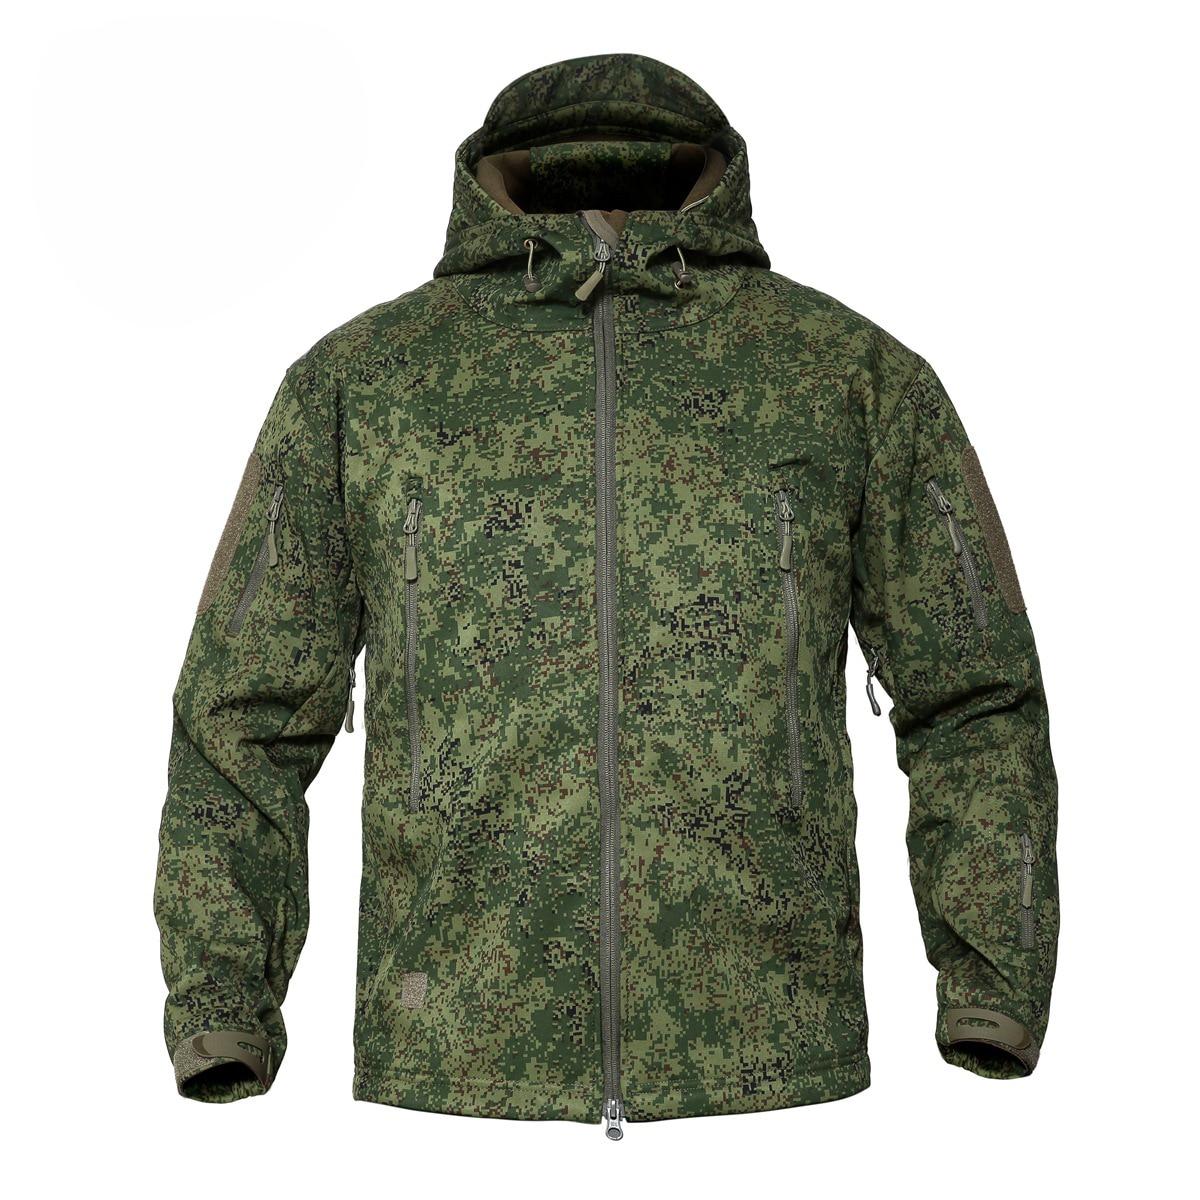 Russian Woodland Digital Camouflage Men's Jackets Outdoor Waterproof Softshell Hooded Tactical Jacket